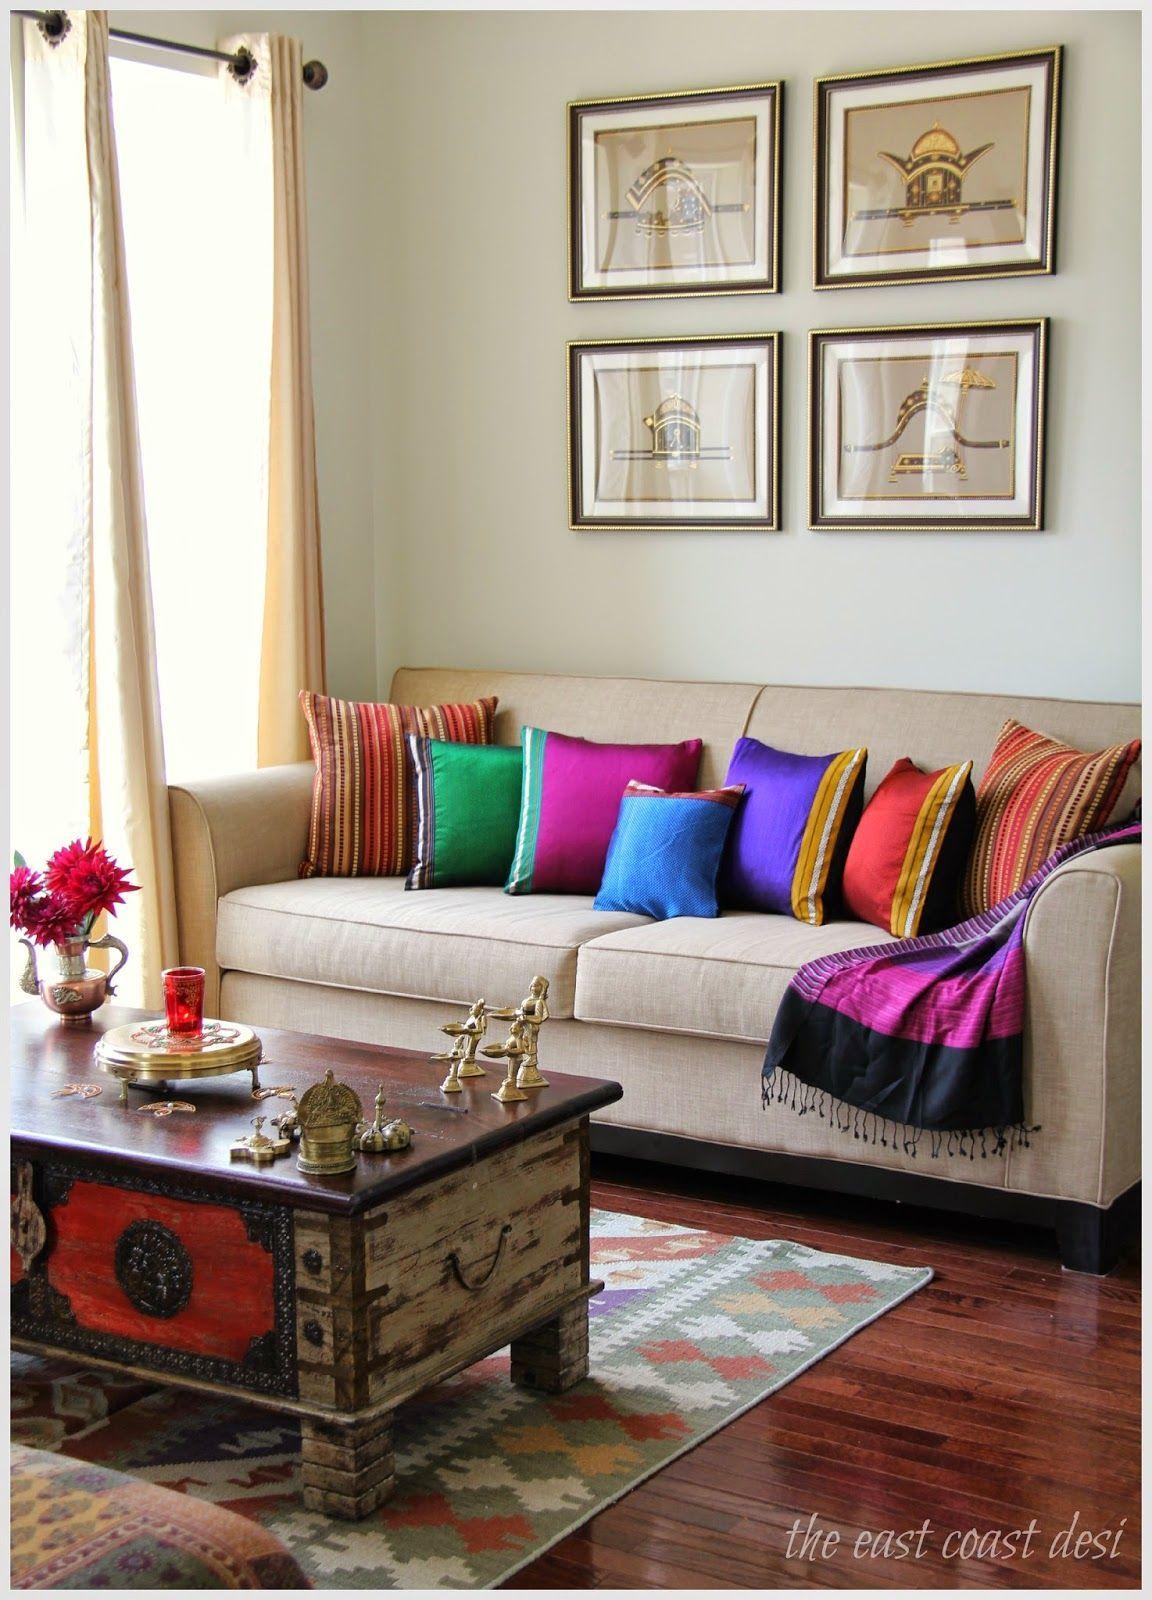 living room design ideas living room designs indian style - Internal Home Design